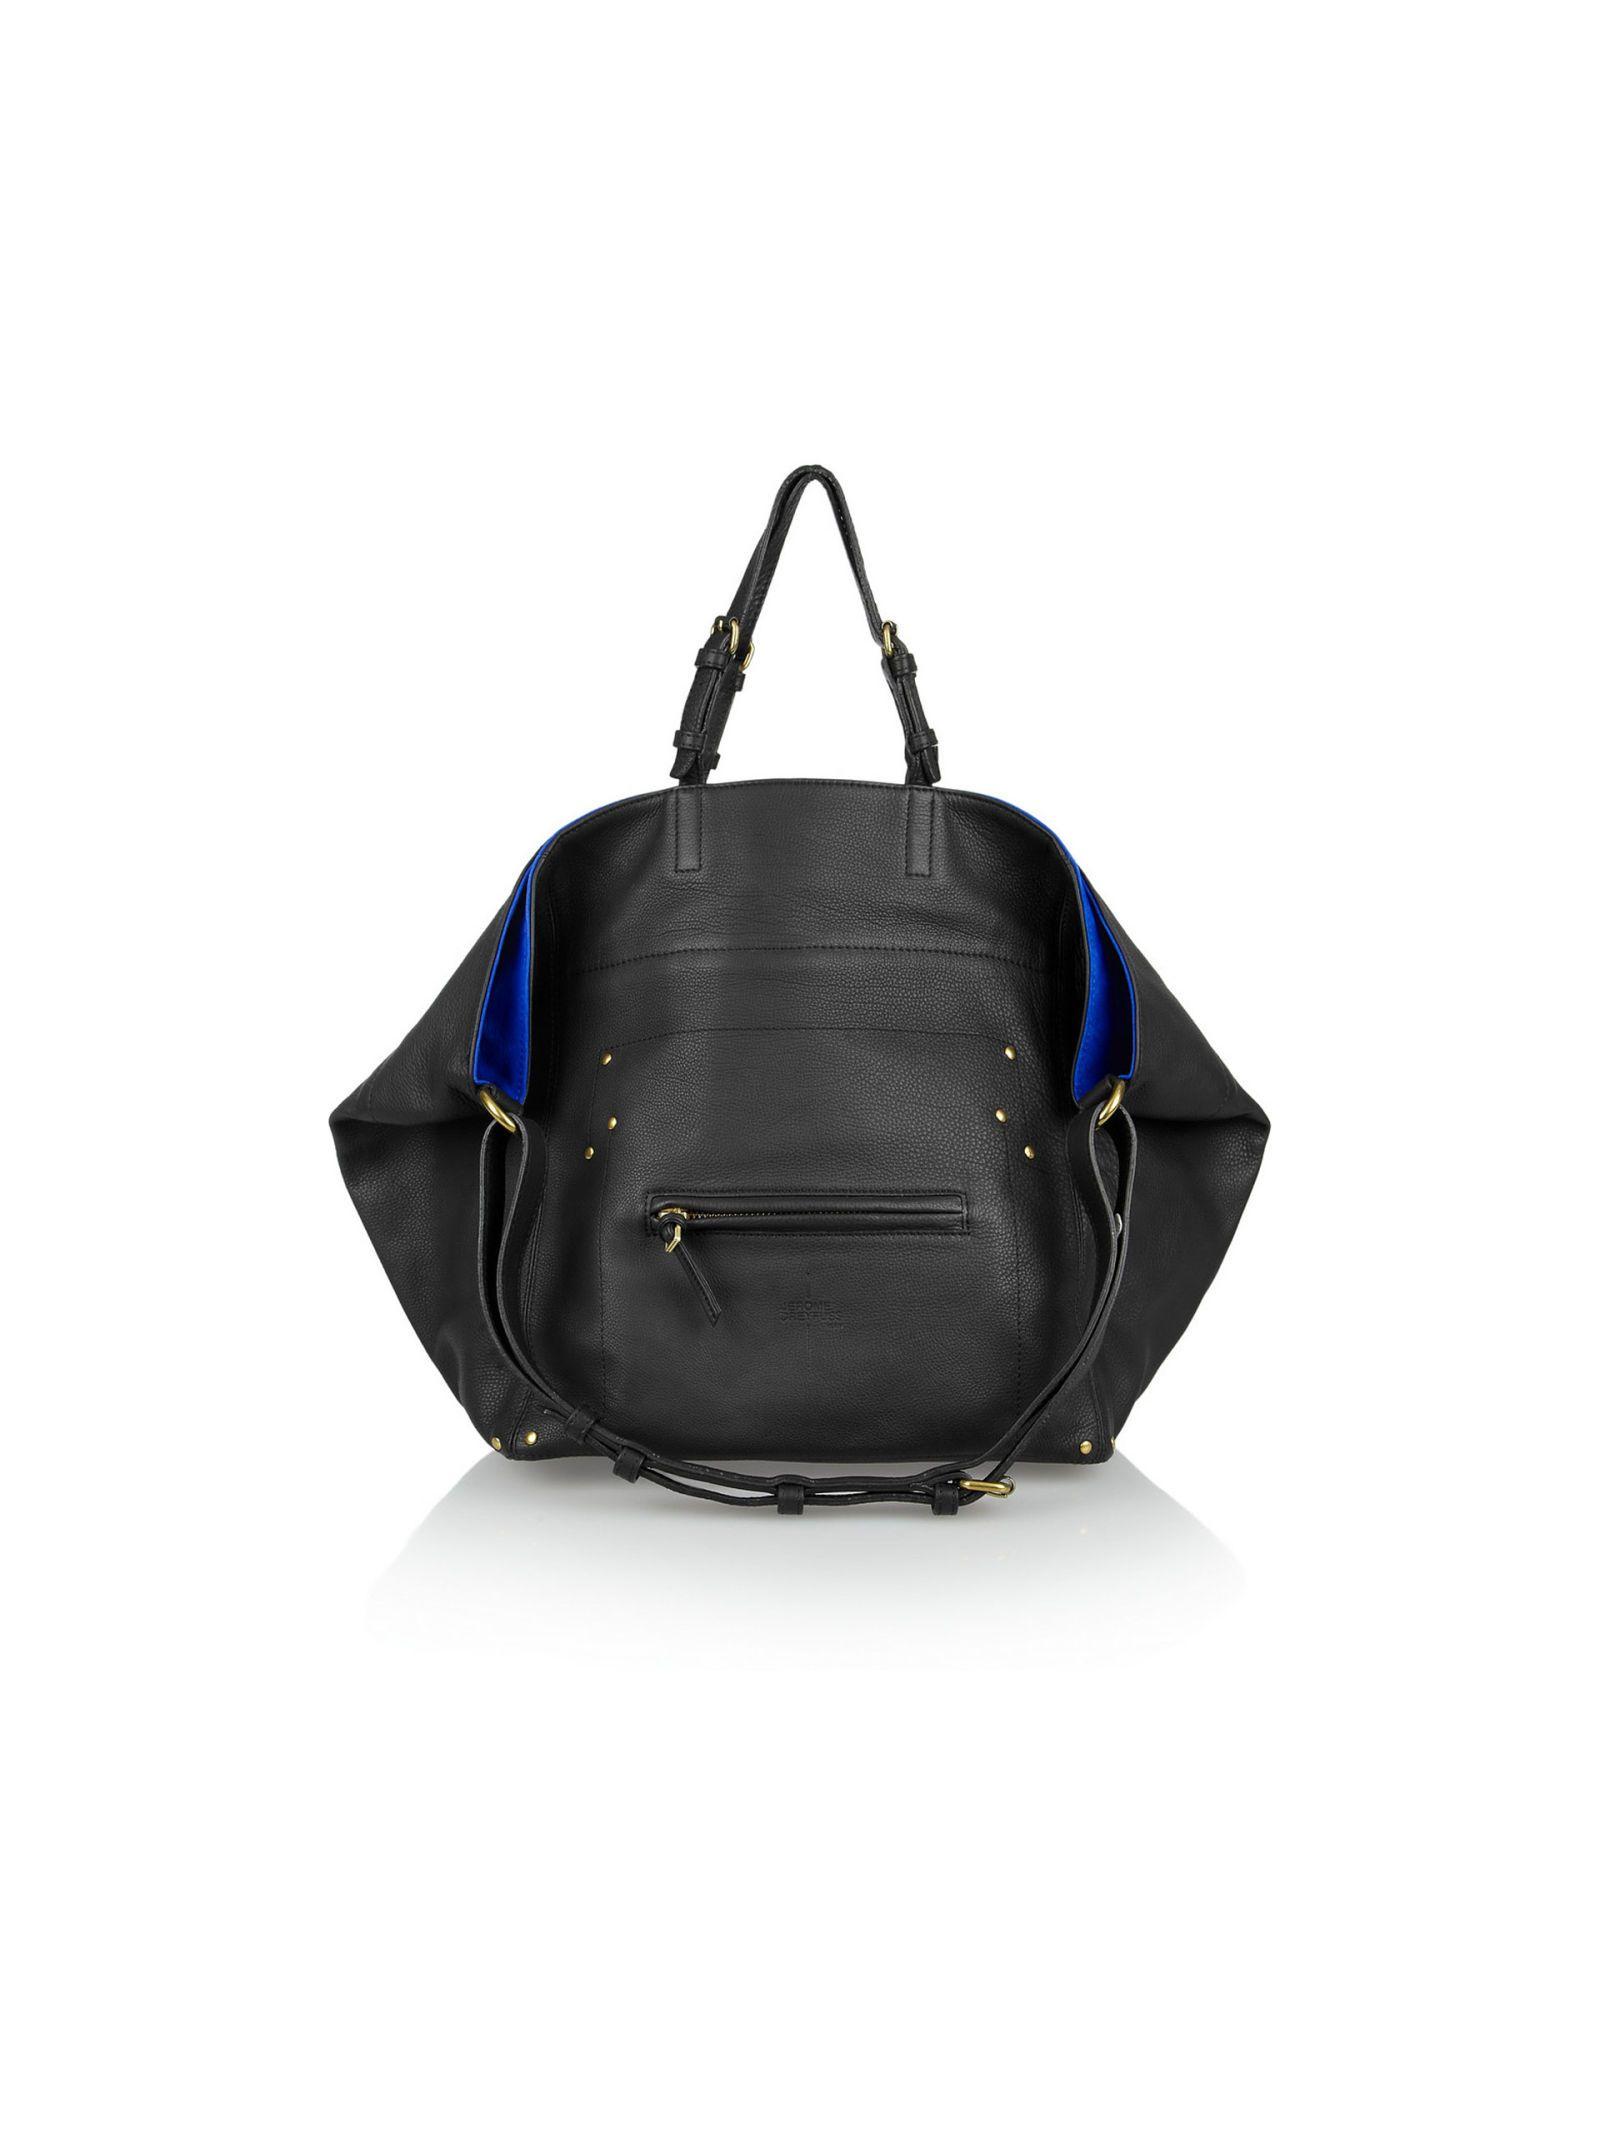 Best Handbags Fall 2013 Handbag Trends Emma Tote Blue Print